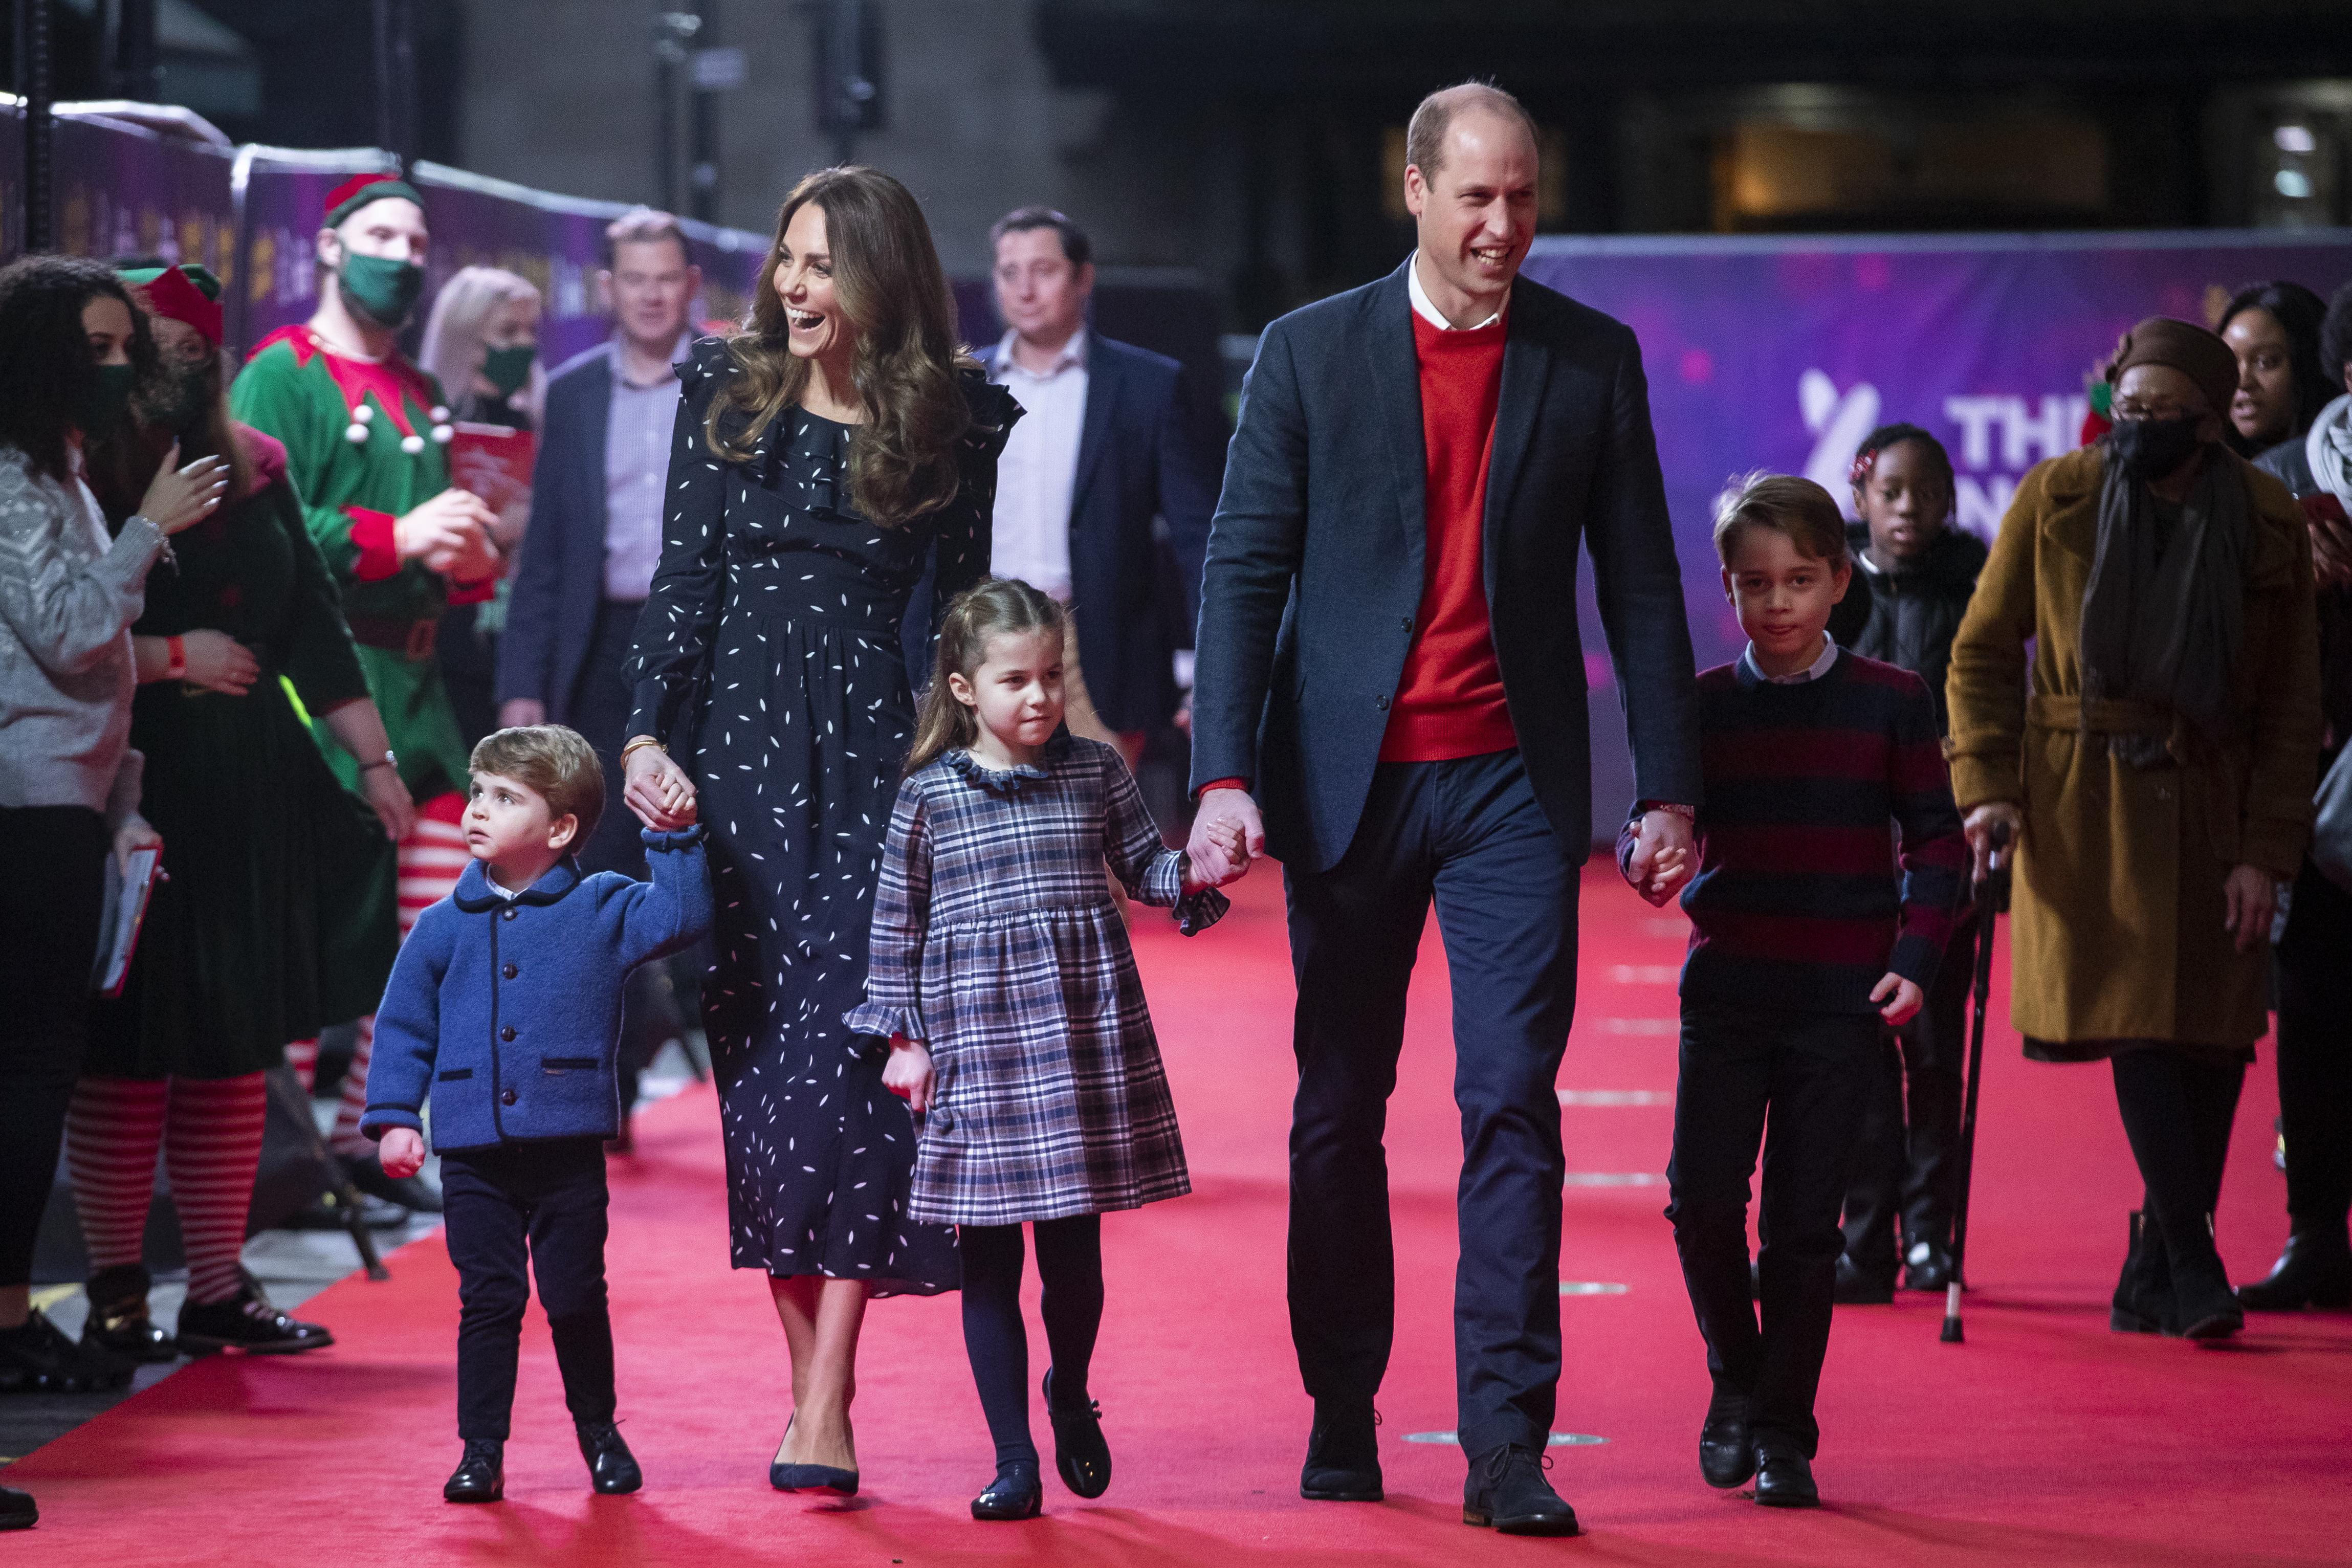 Photos of Prince William, Kate Middleton, Prince George, Princess Charlotte and Prince Louis at the London Palladium